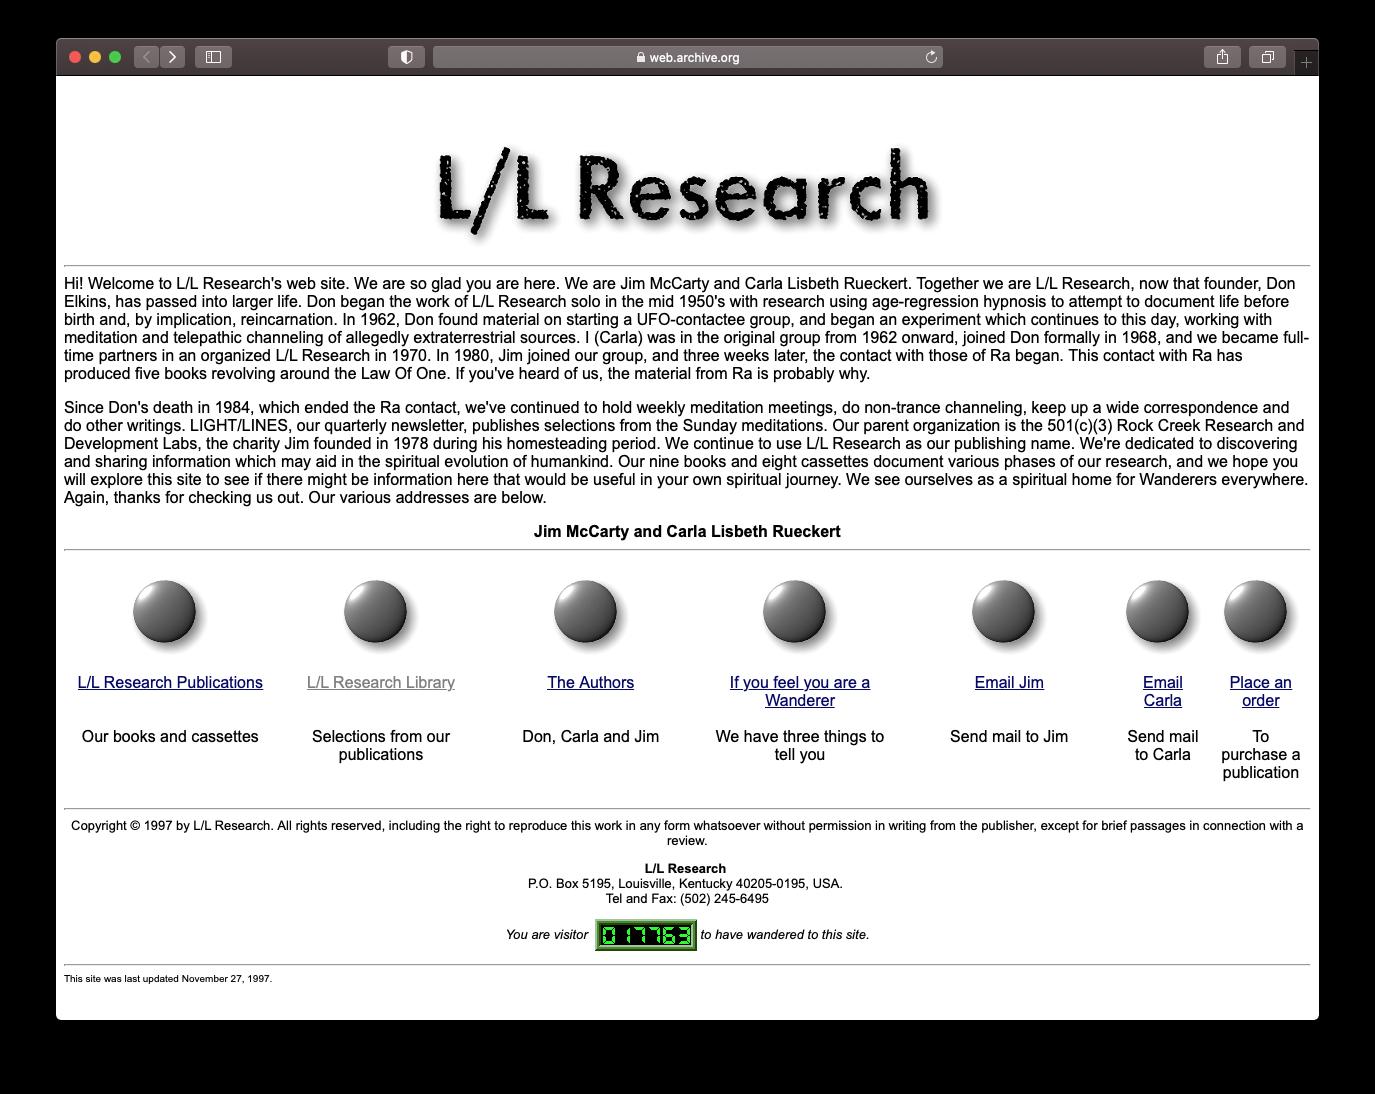 LLResearch.org - 1997